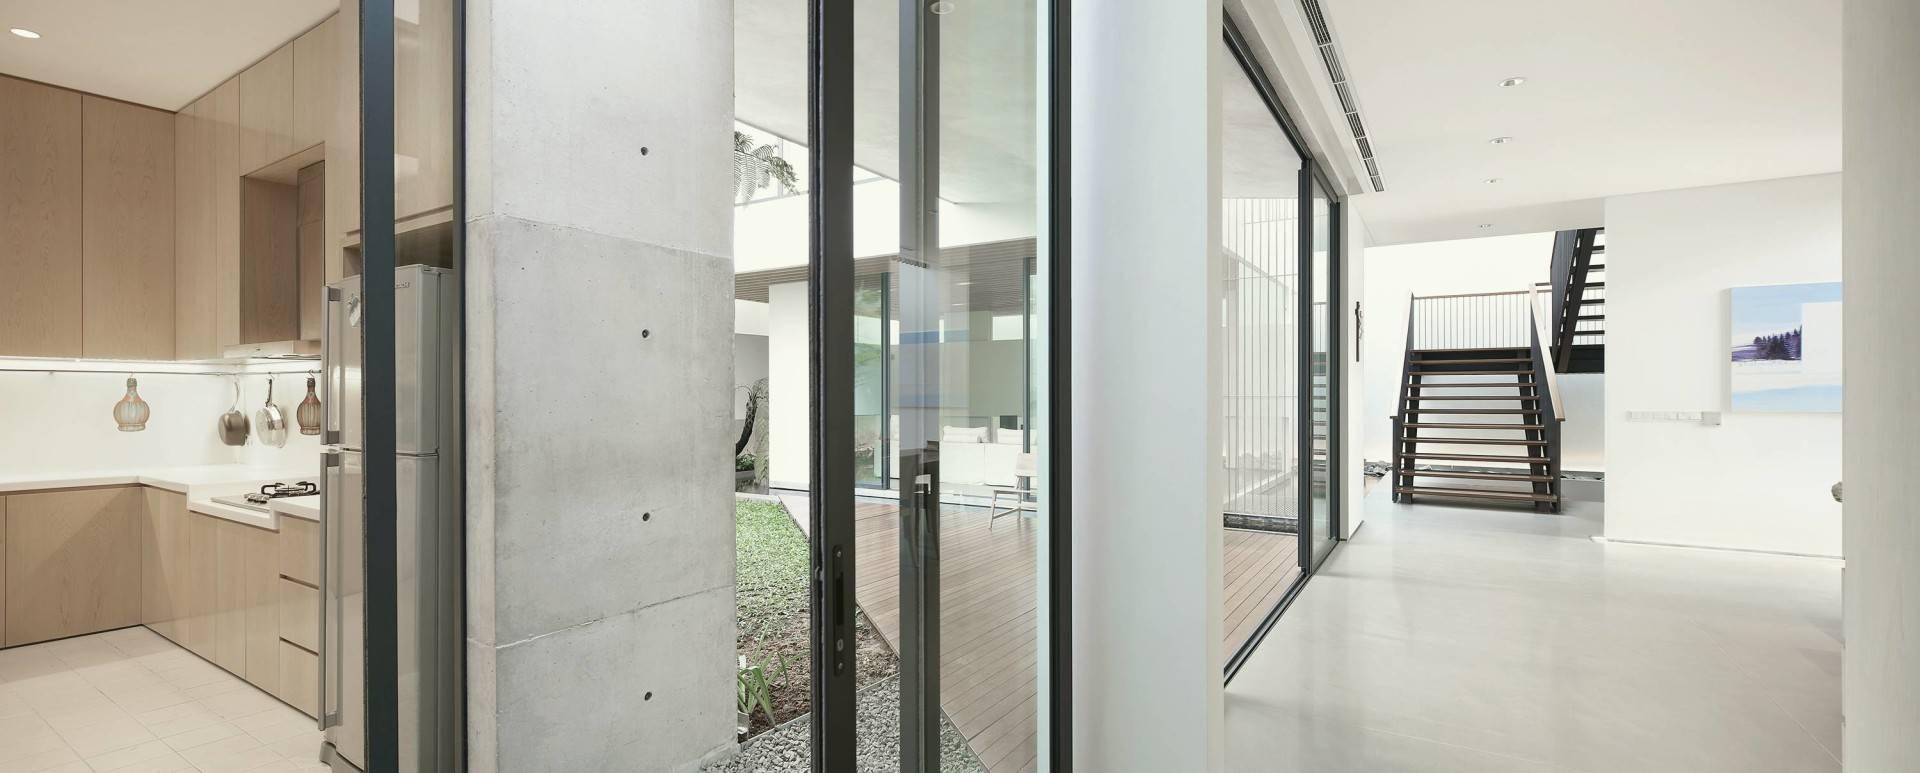 Antony Liu + Ferry Ridwan / Studio Tonton Mm House Permata Buana, Jakarta, Indonesia Permata Buana, Jakarta, Indonesia Interior Modern  8164